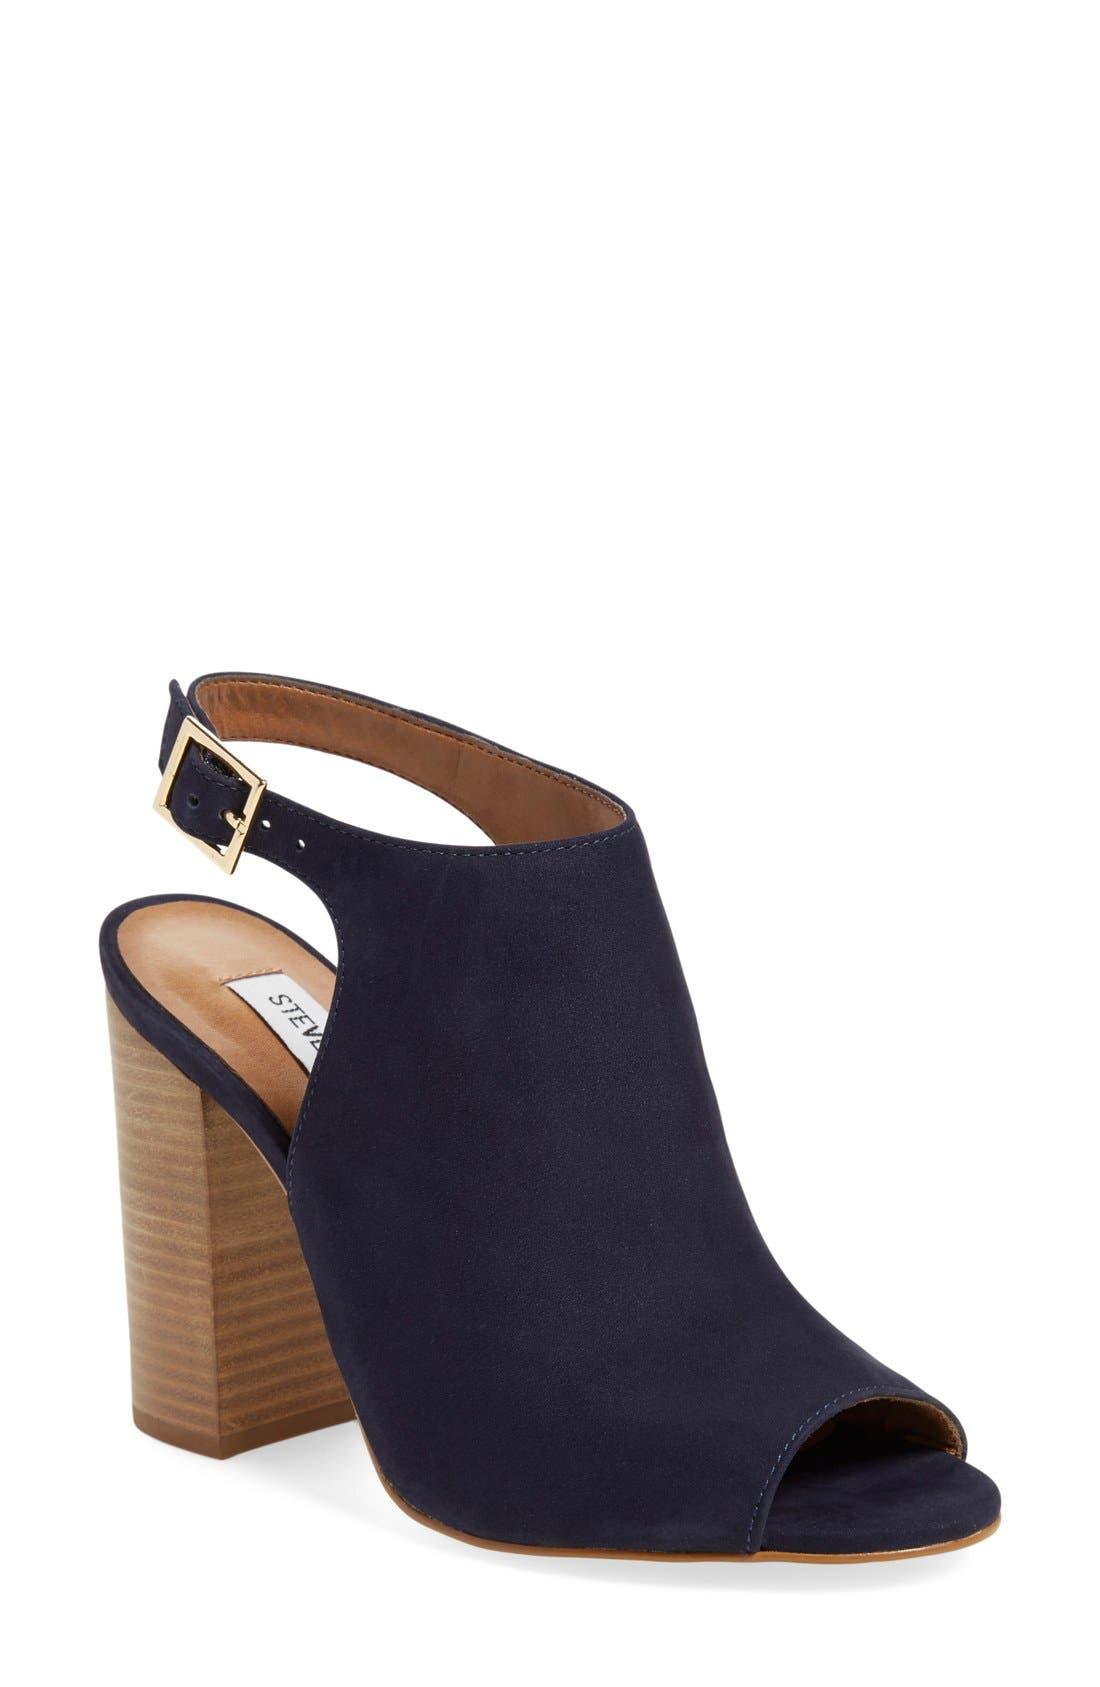 Alternate Image 1 Selected - Steve Madden 'Claara' Block Heel Sandal (Women)